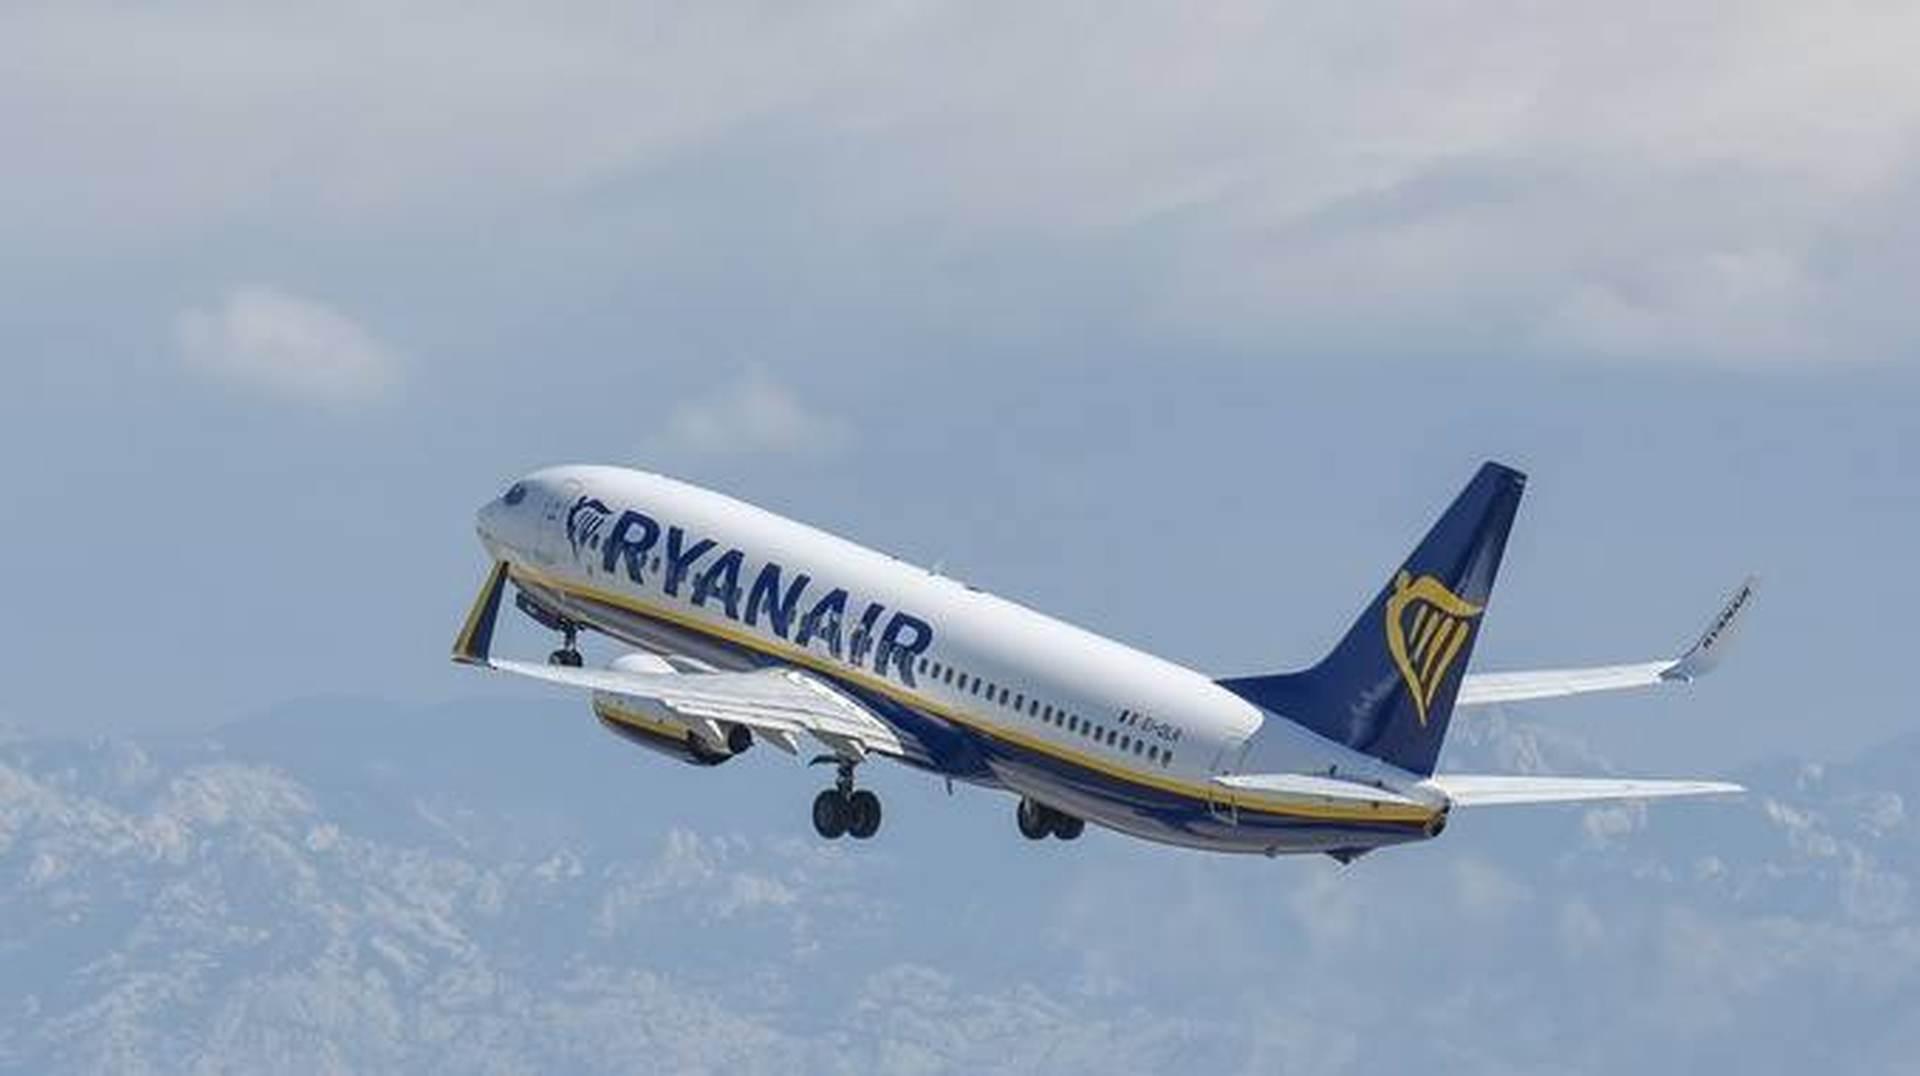 LAŽNA DOJAVA: Ryanair zbog navodne bombe sletio u Varšavu